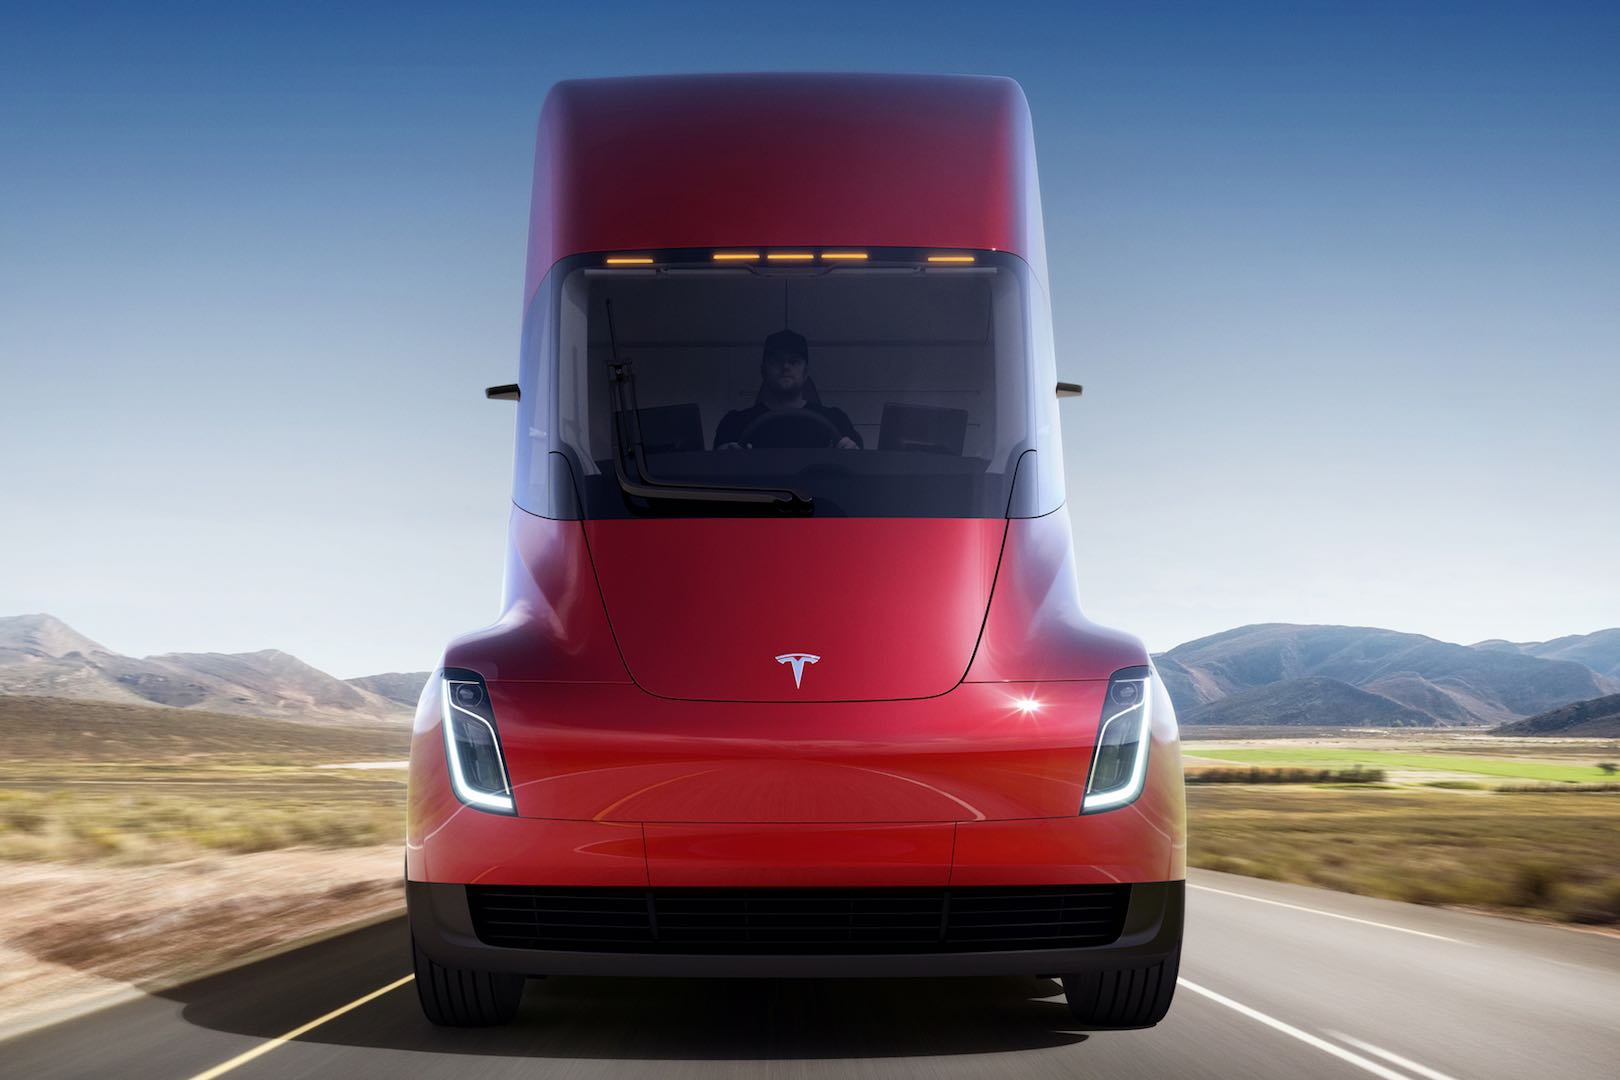 Tesla_Semi_LKW_vorne_rot